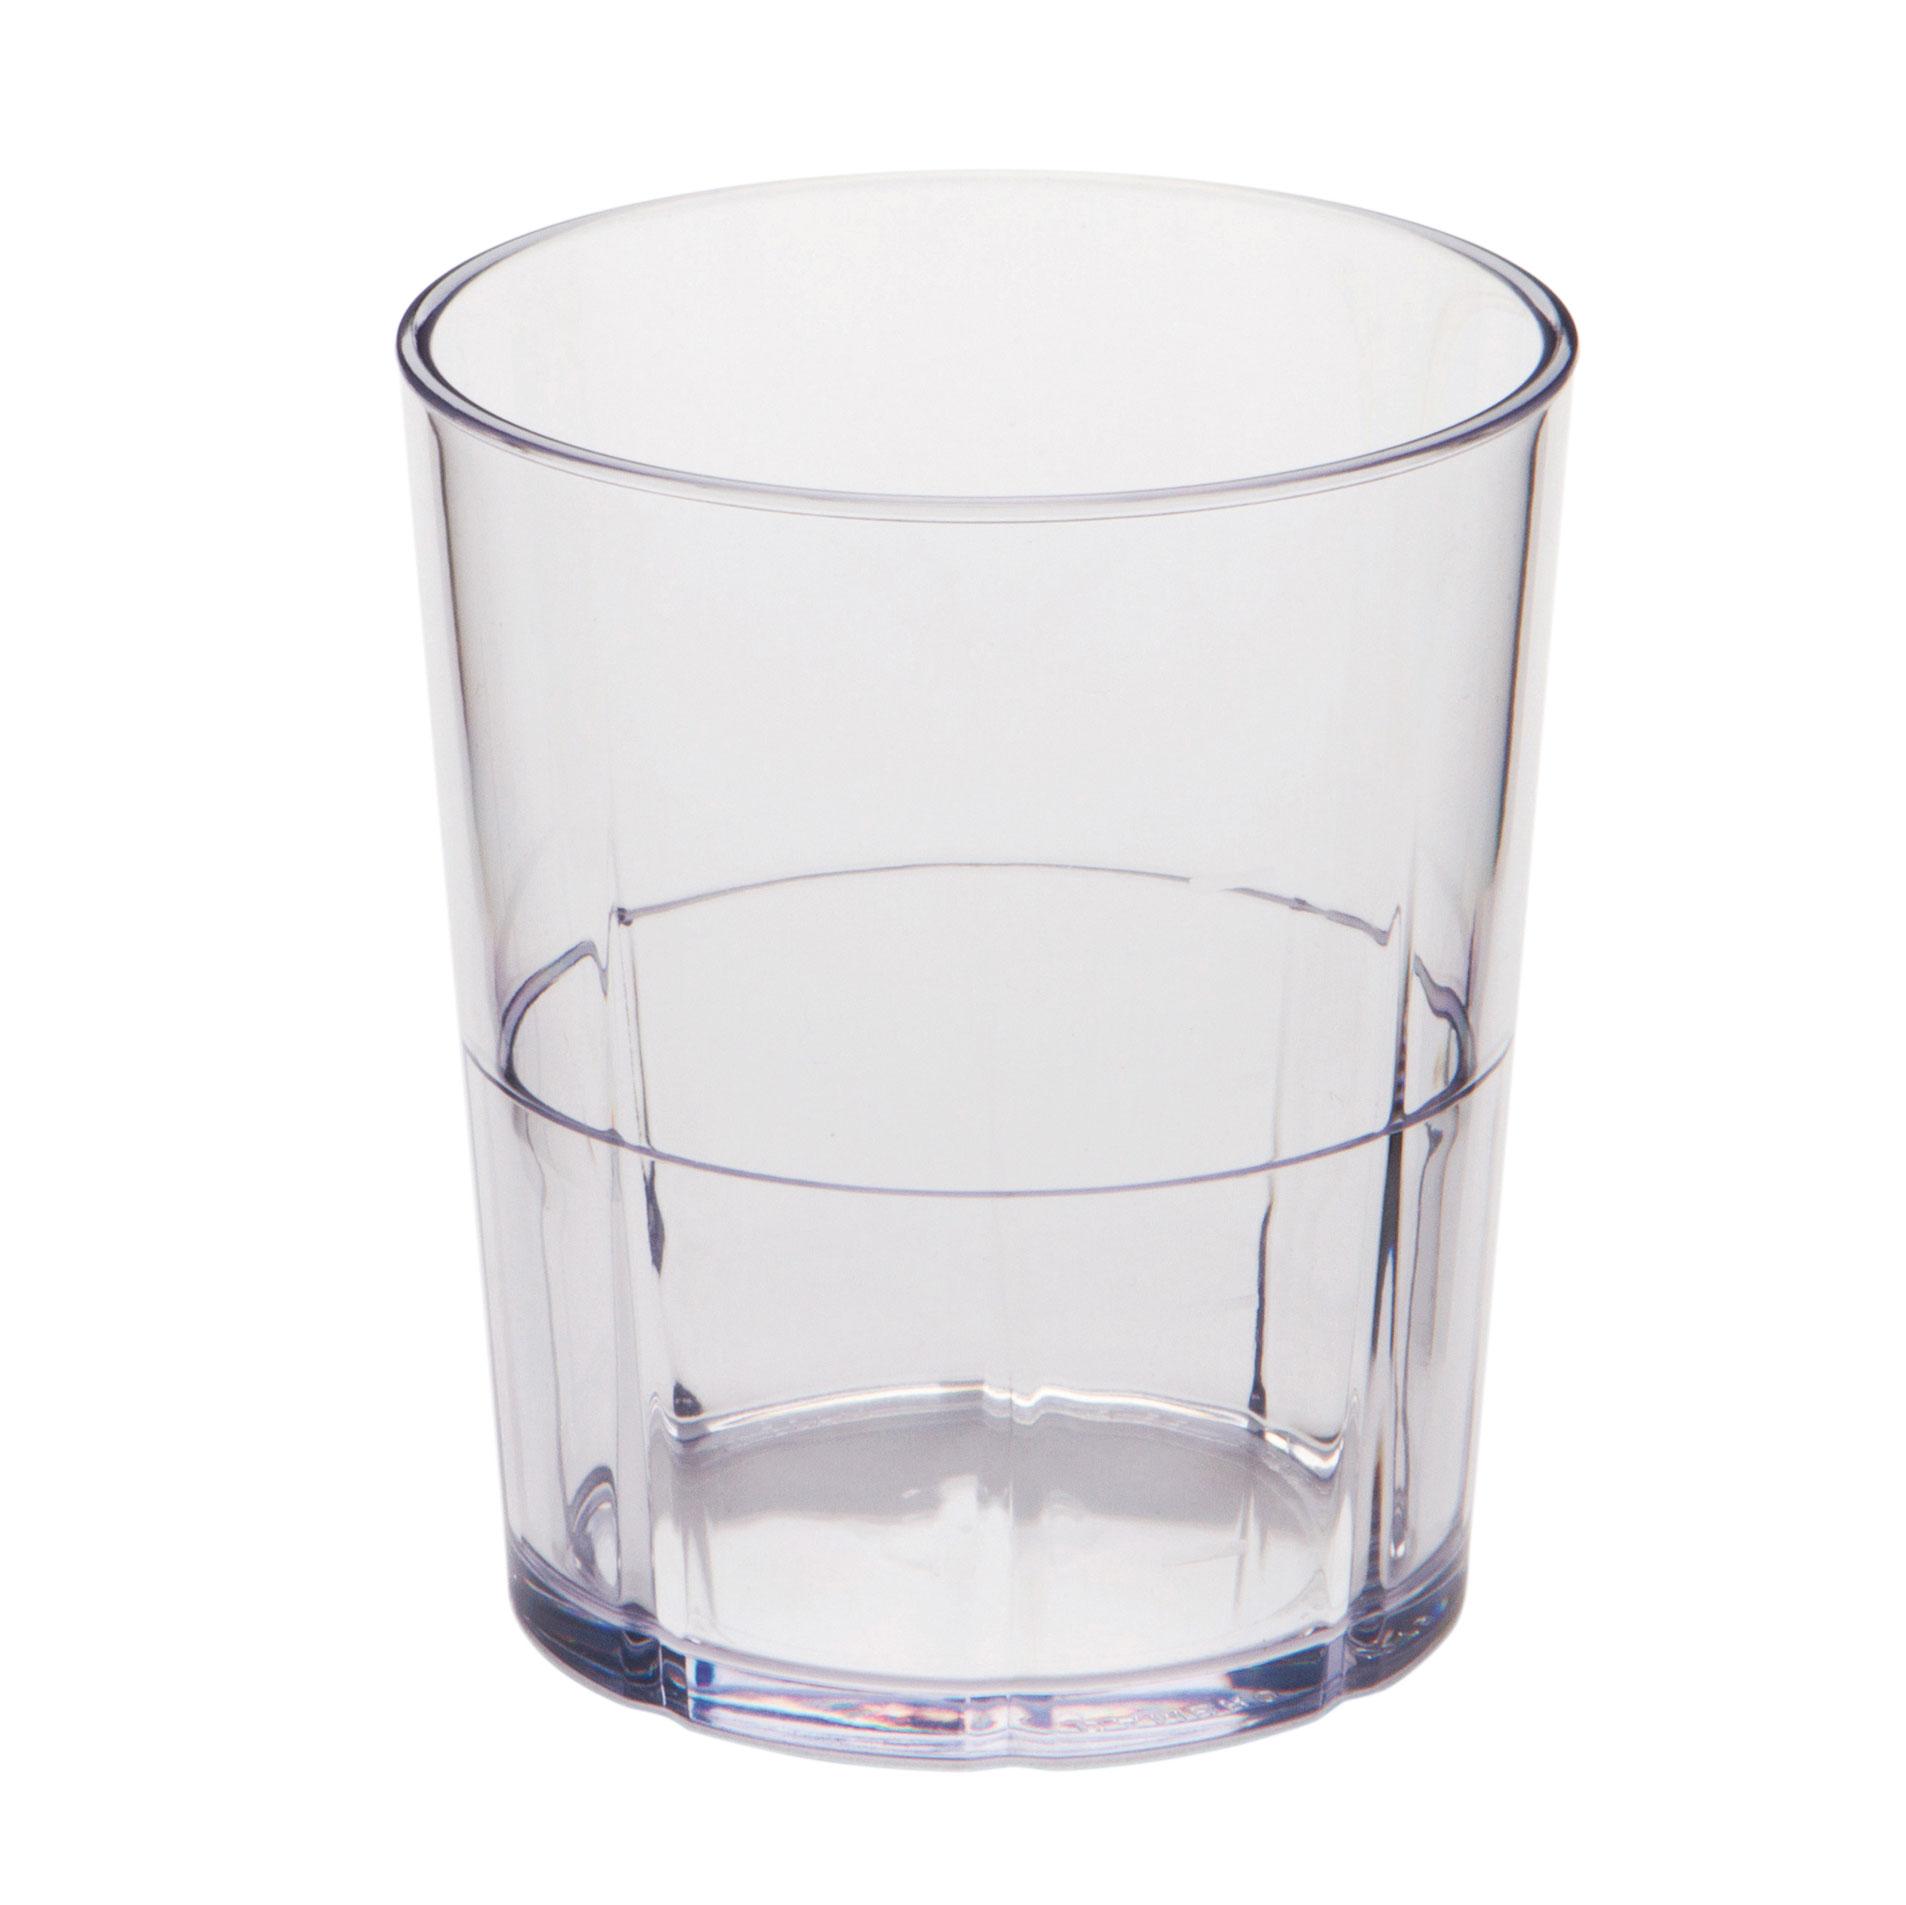 Cambro LDT9152 plastic drinkware